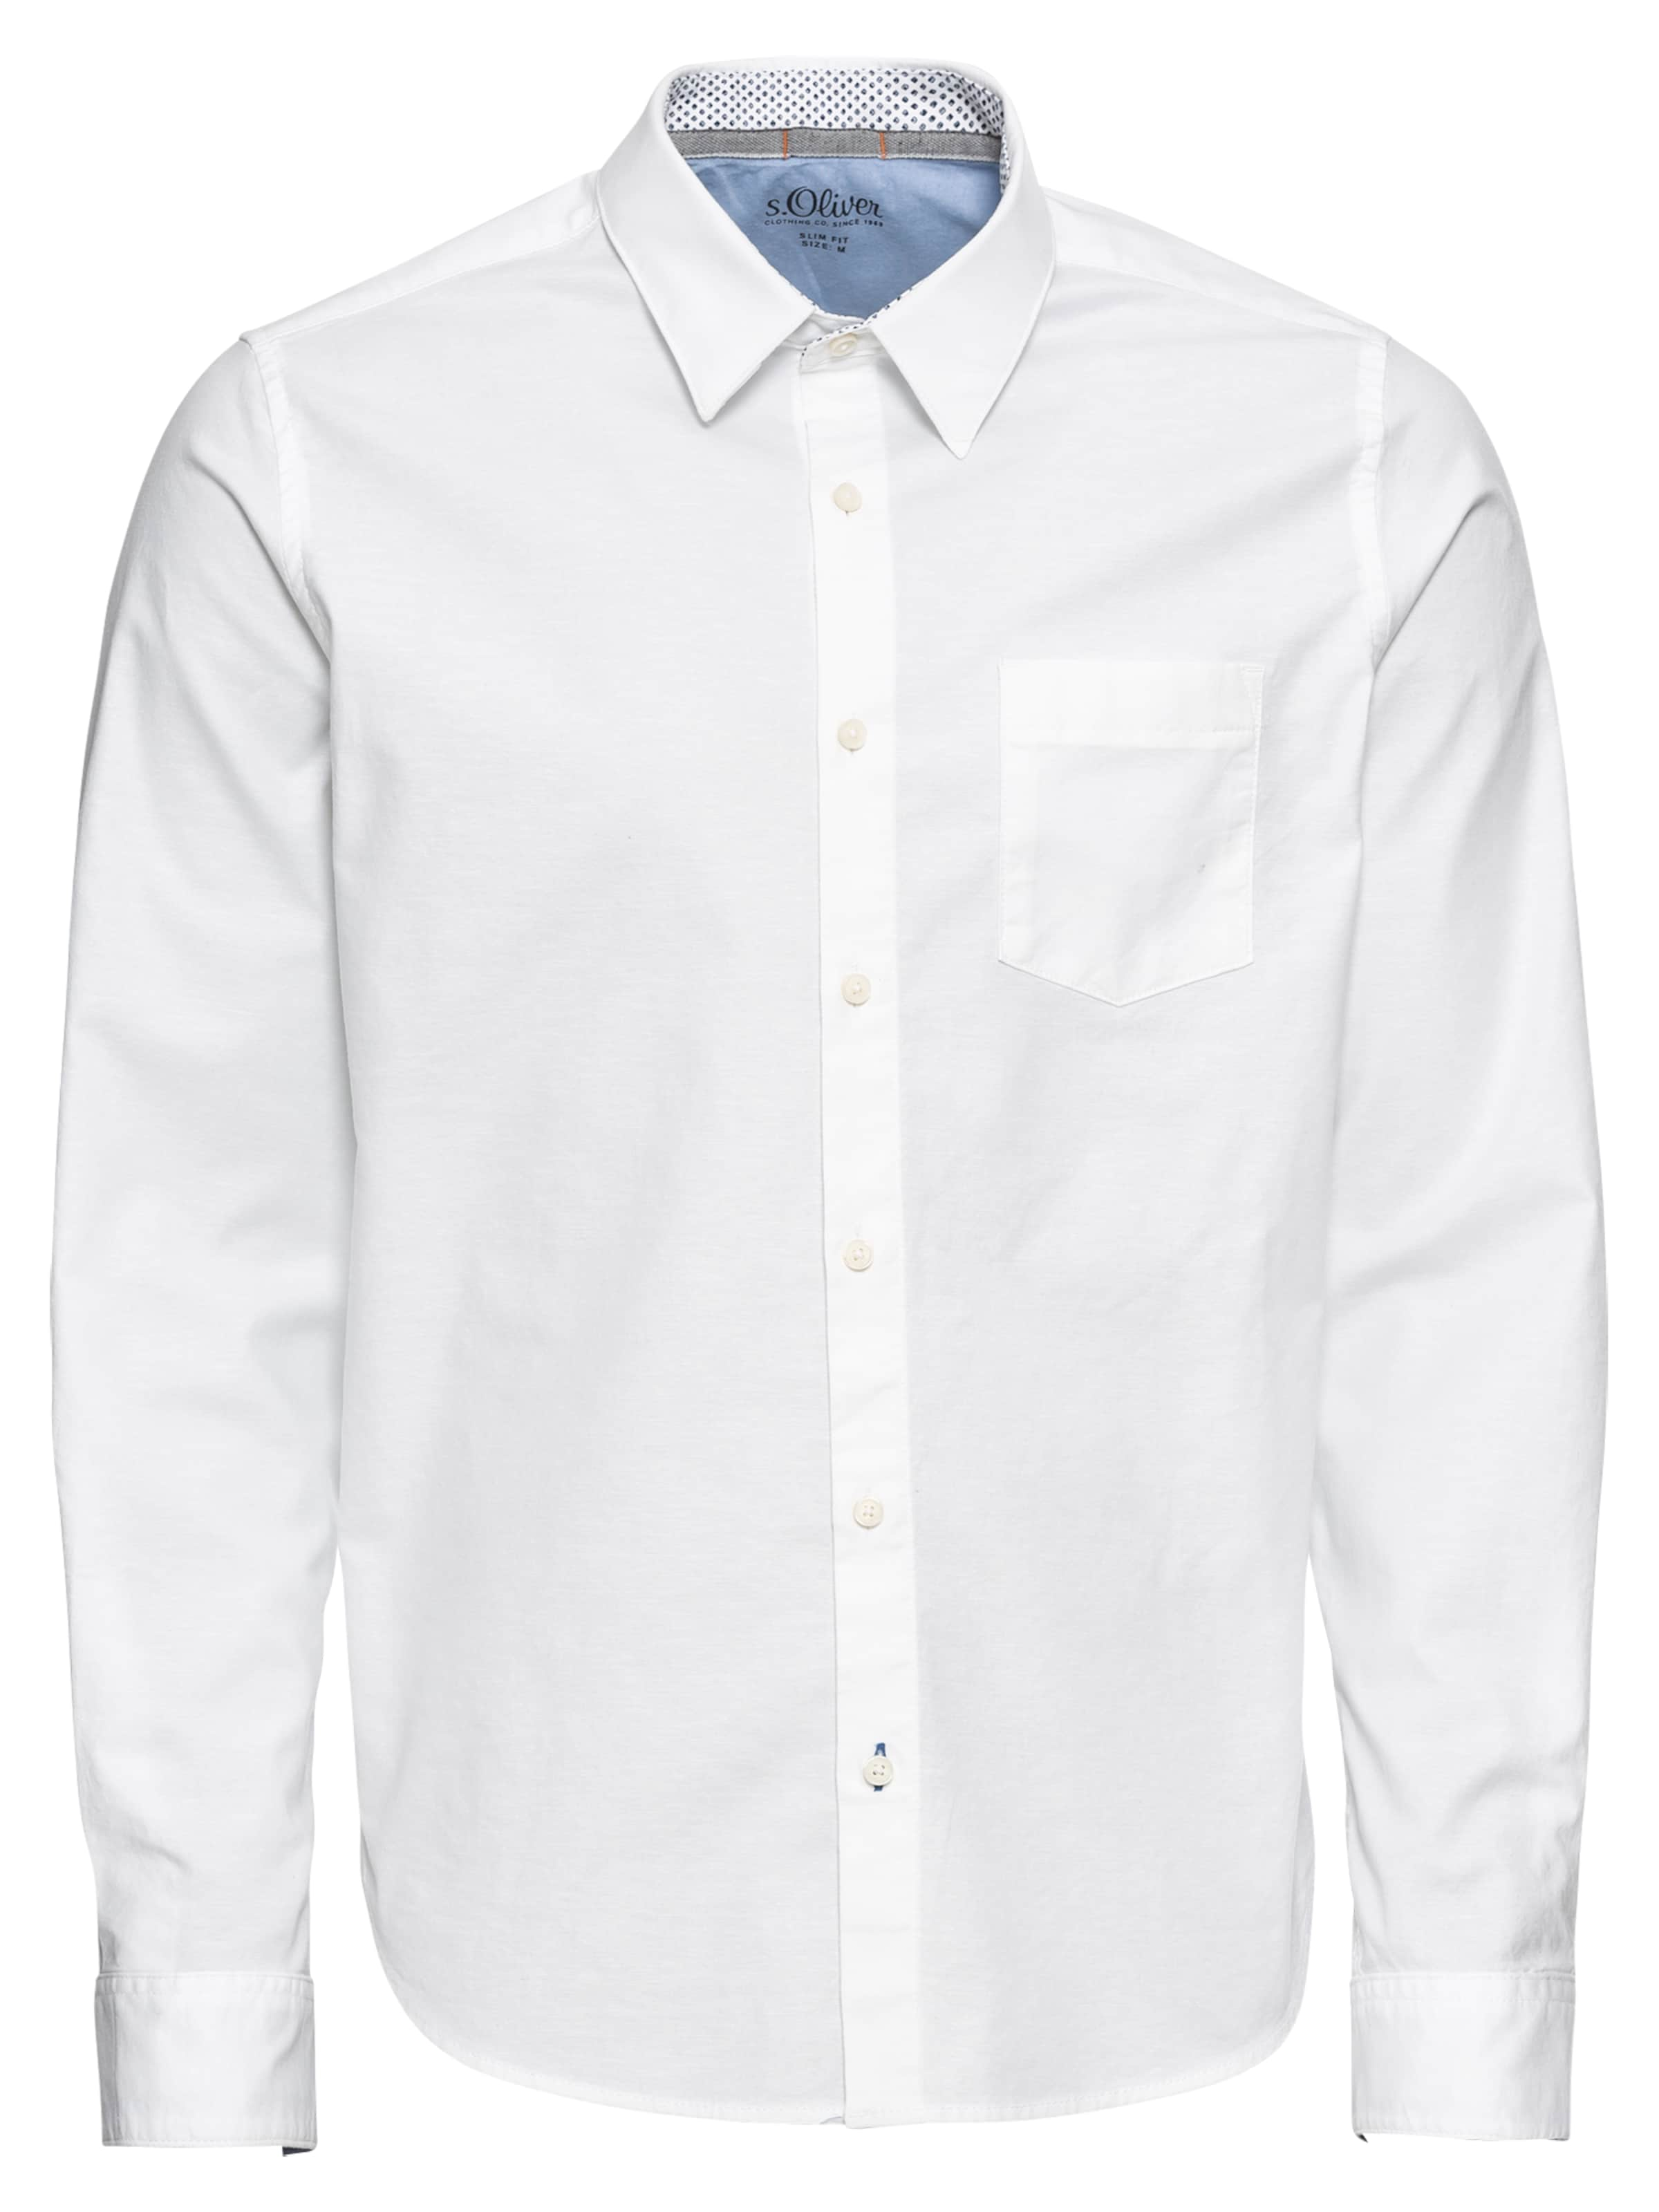 S Hemd S Hemd Weiß oliver S oliver In oliver In Weiß mNOn8wv0